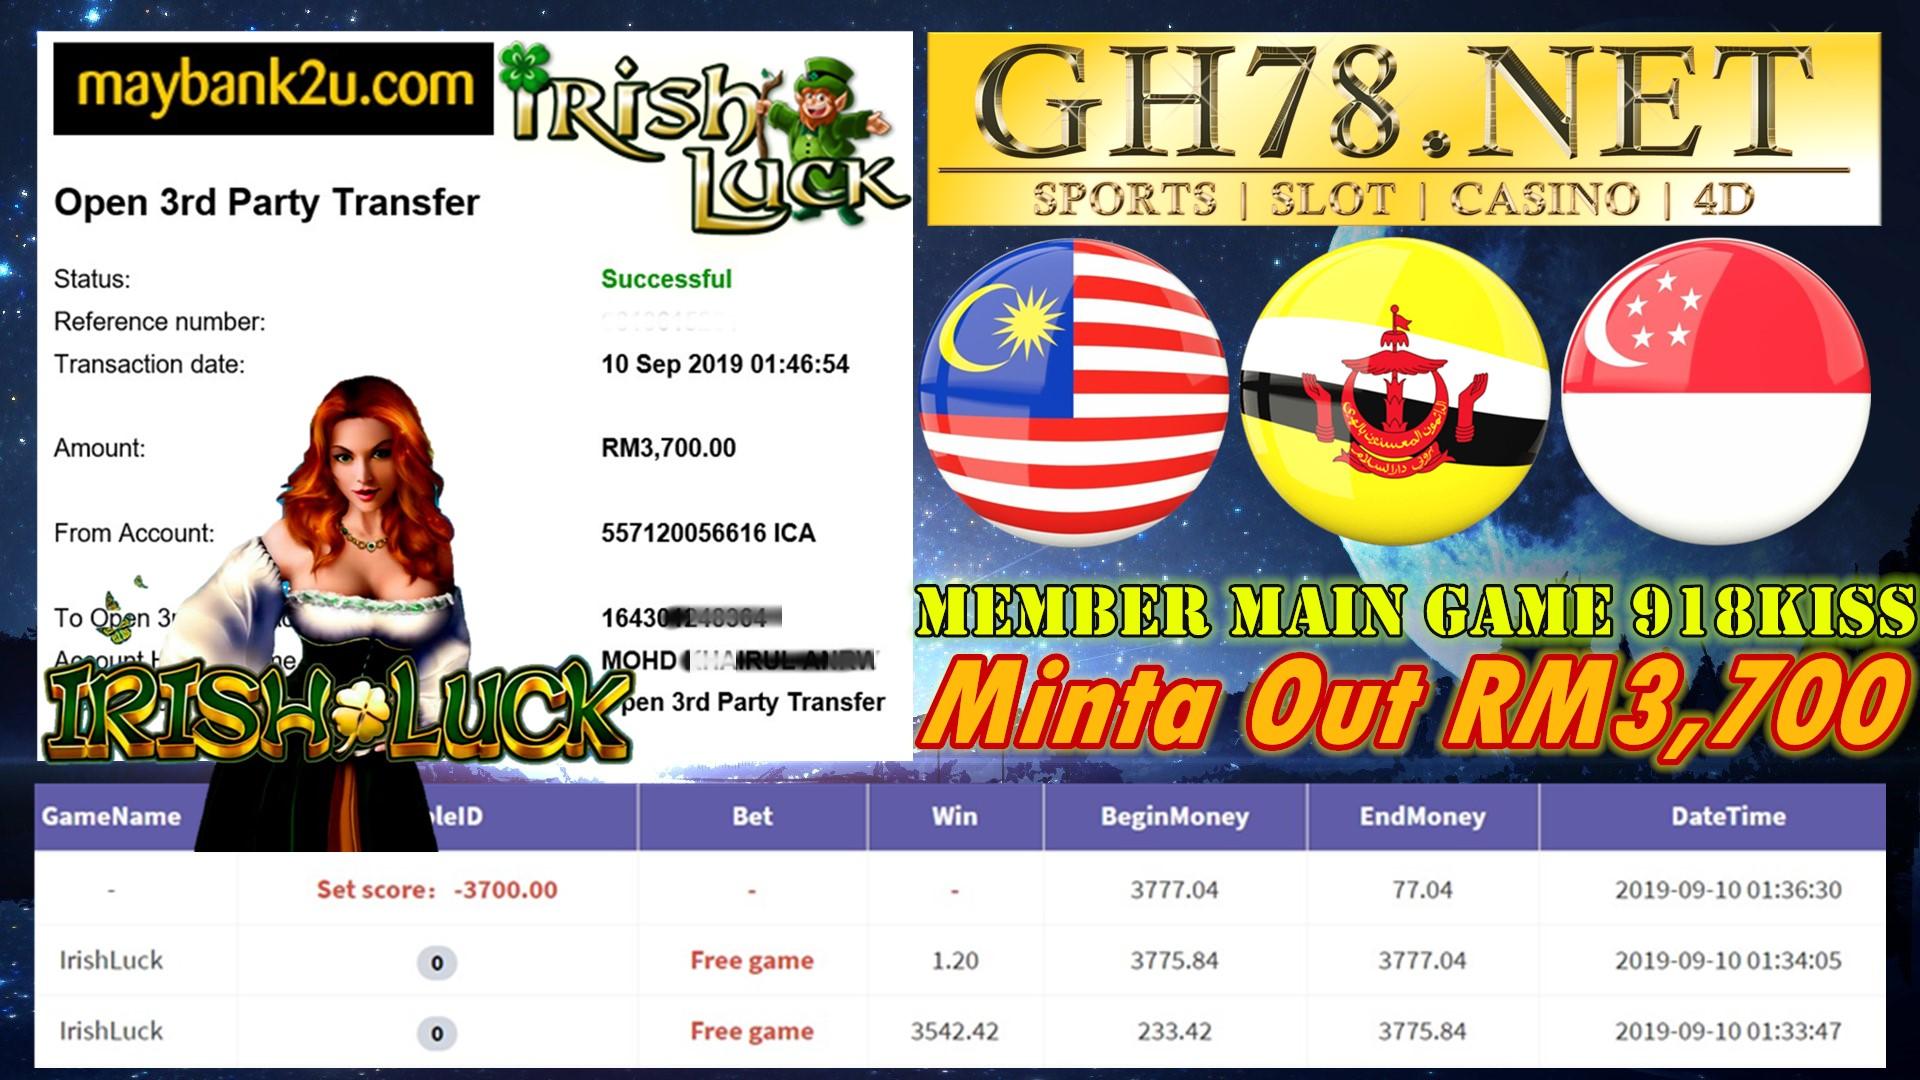 MEMBER MAIN GAME 918KISS FT.IRISHLUCK MINTA OUT RM3,700